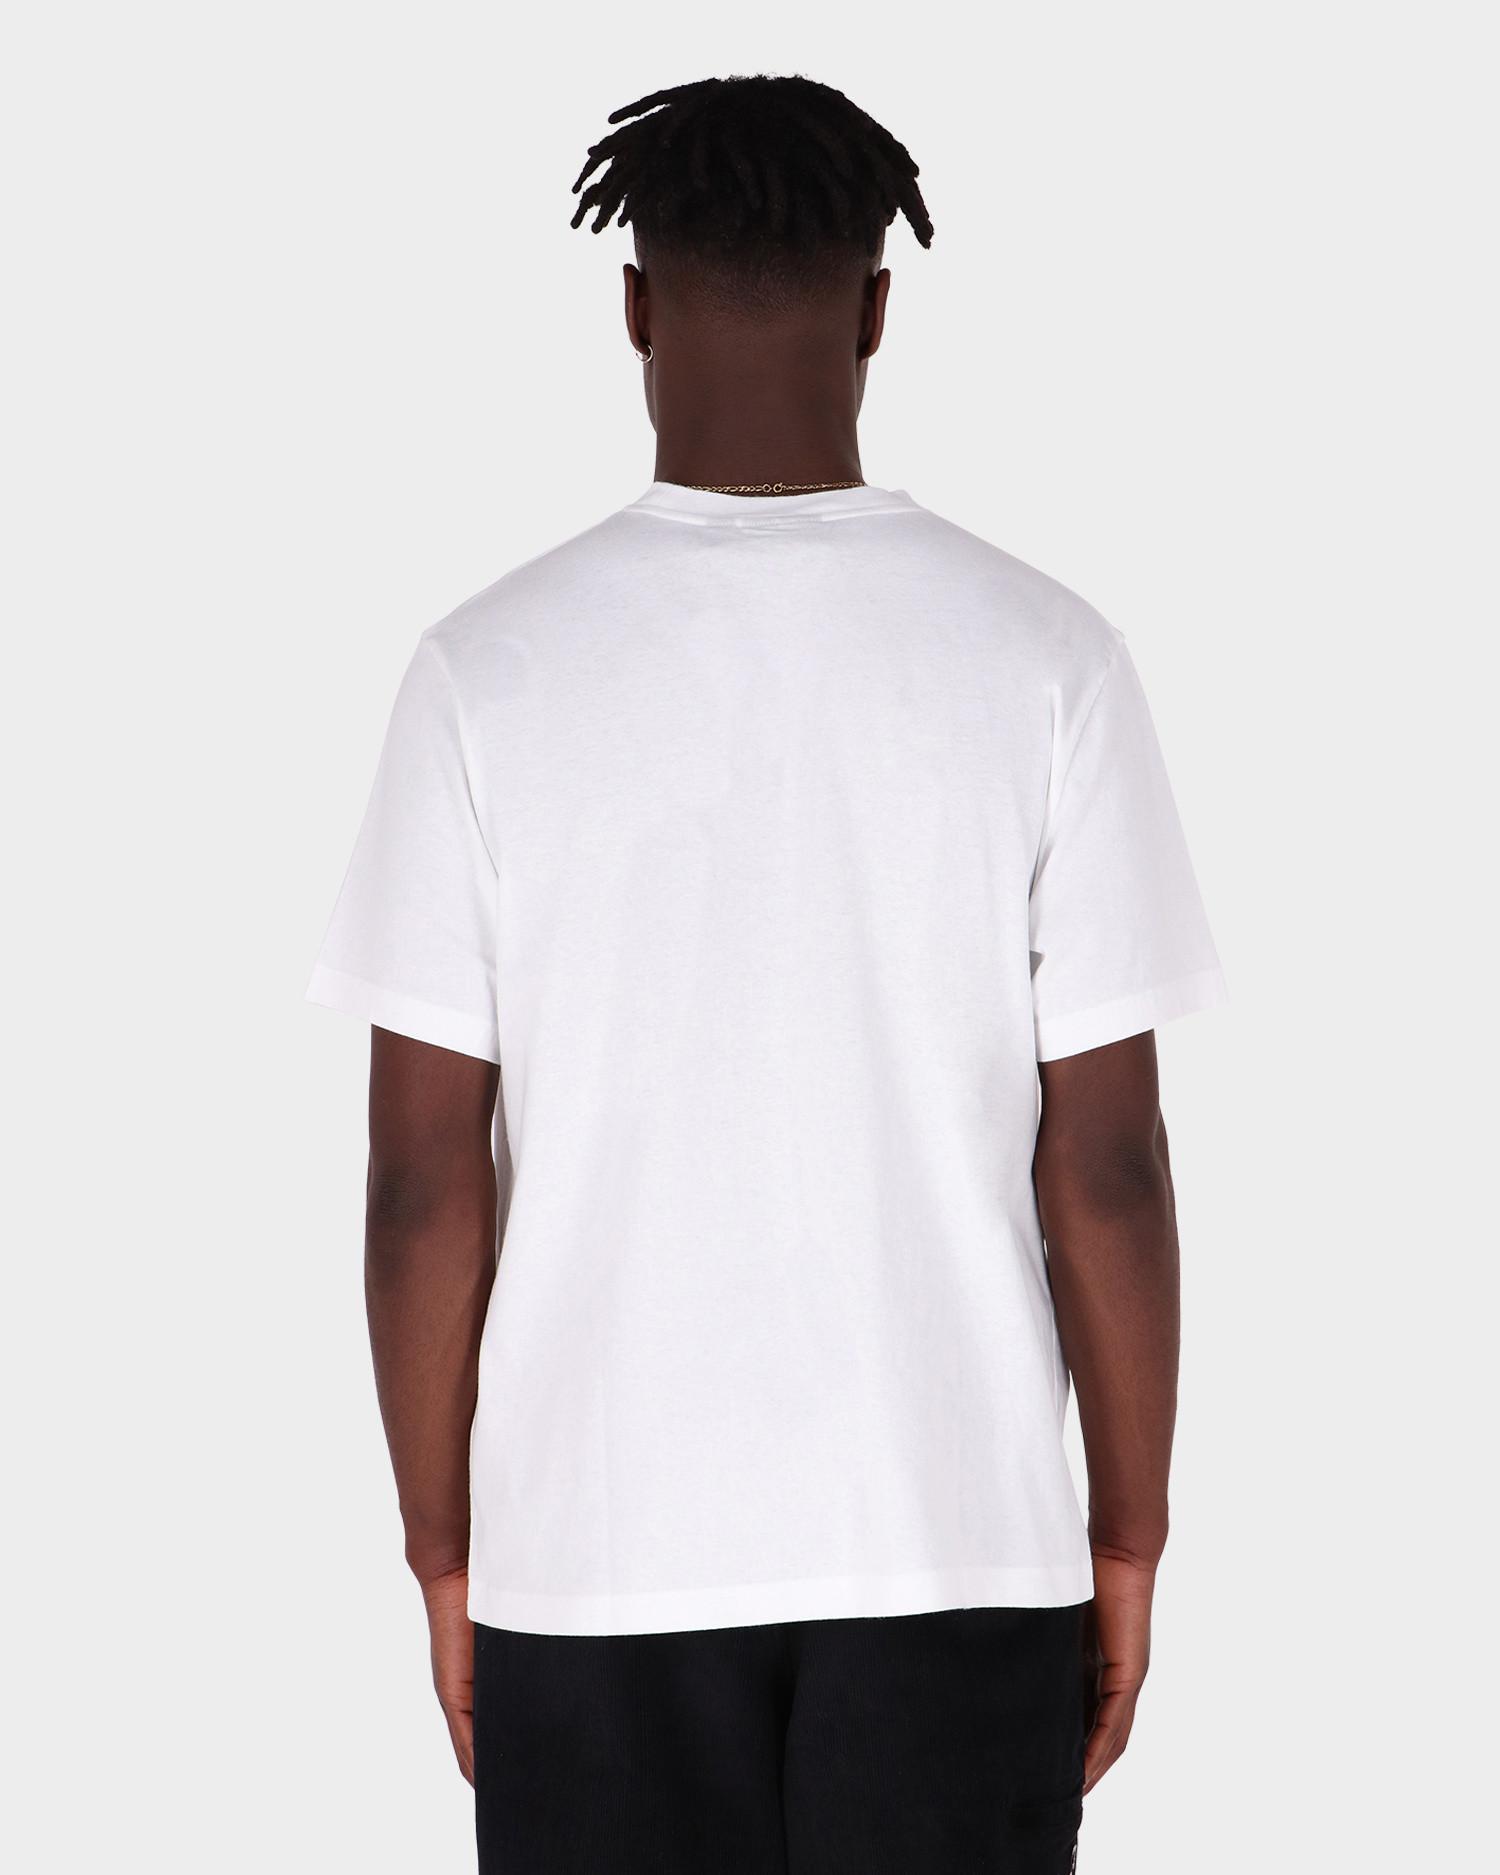 Parra Too Loud T-shirt White